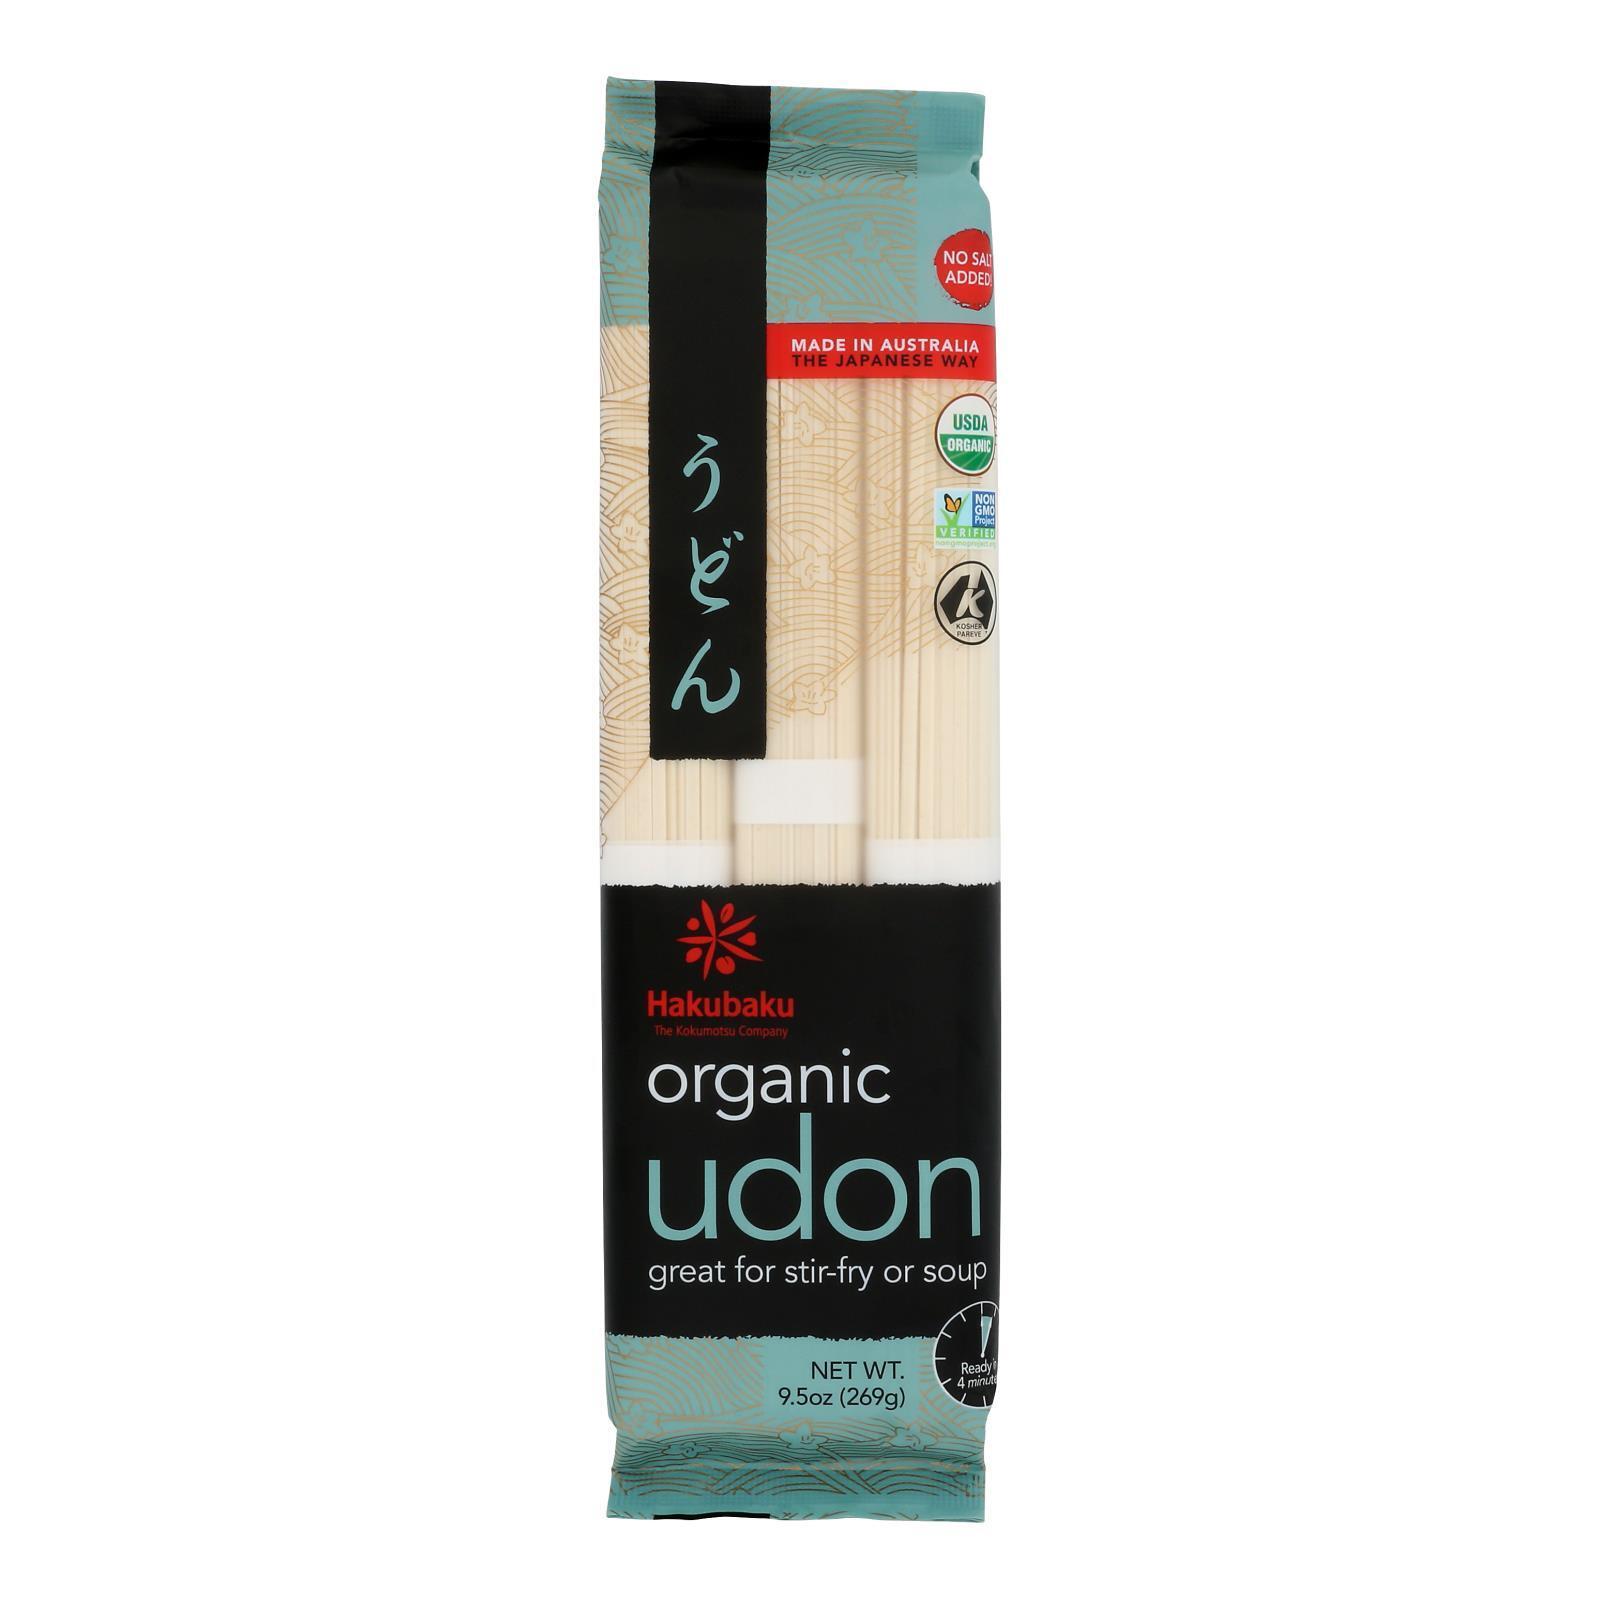 Hakubaku Organic Udon - Case of 8 - 9.52 oz.